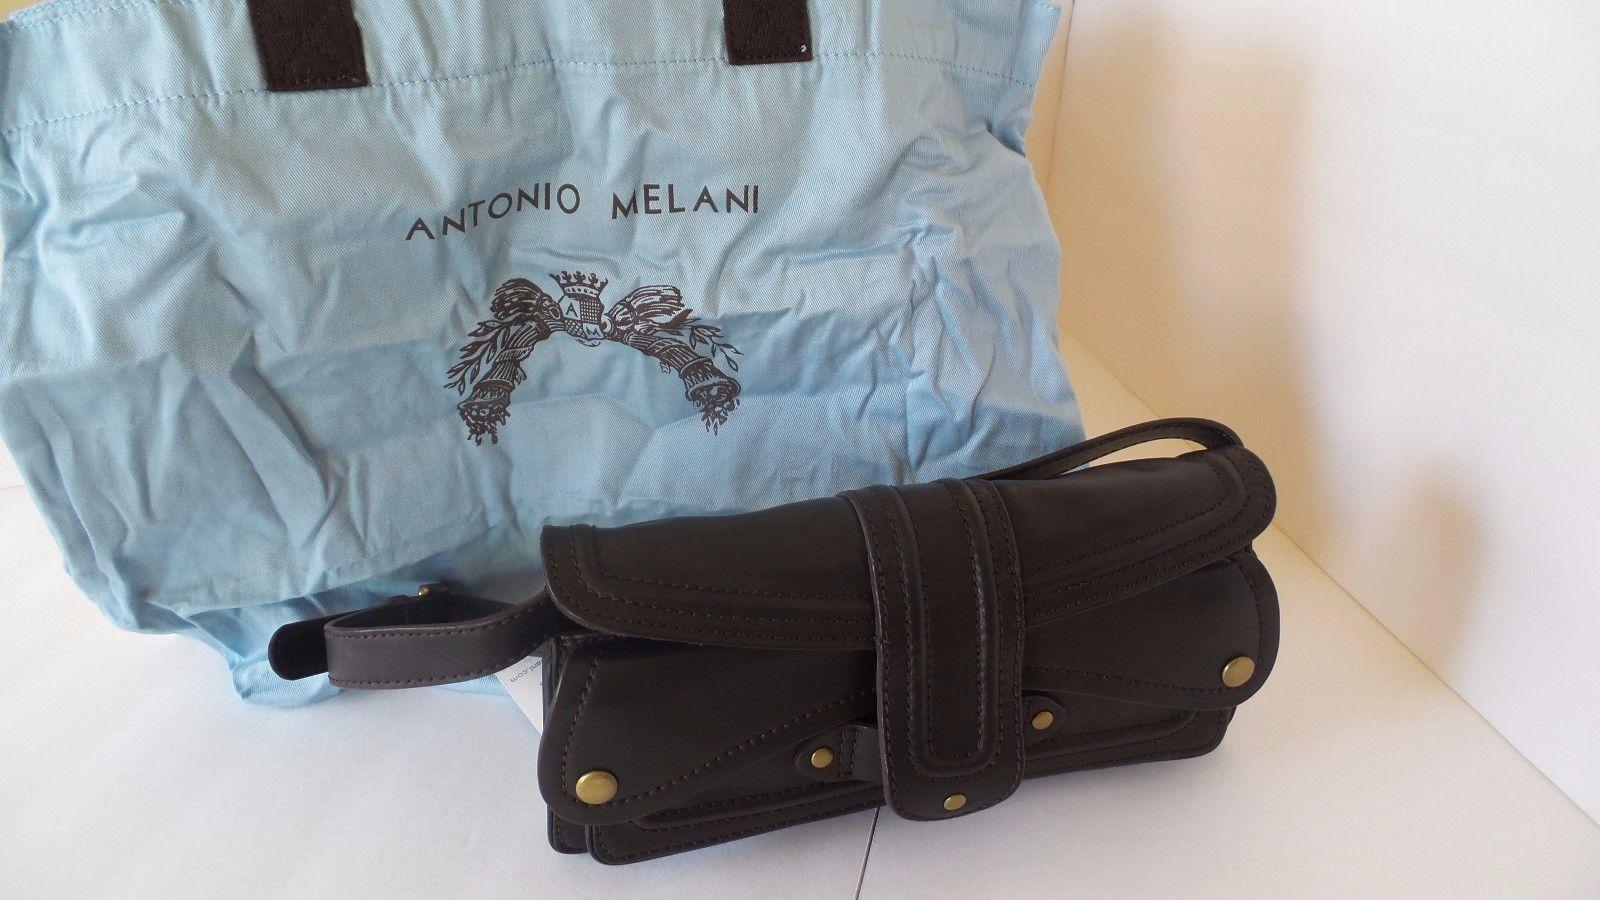 ASPIRIN ALLERGY MEDICAL ALERT ID Italian 9mm Charm ME045 Fits Nomination Classic